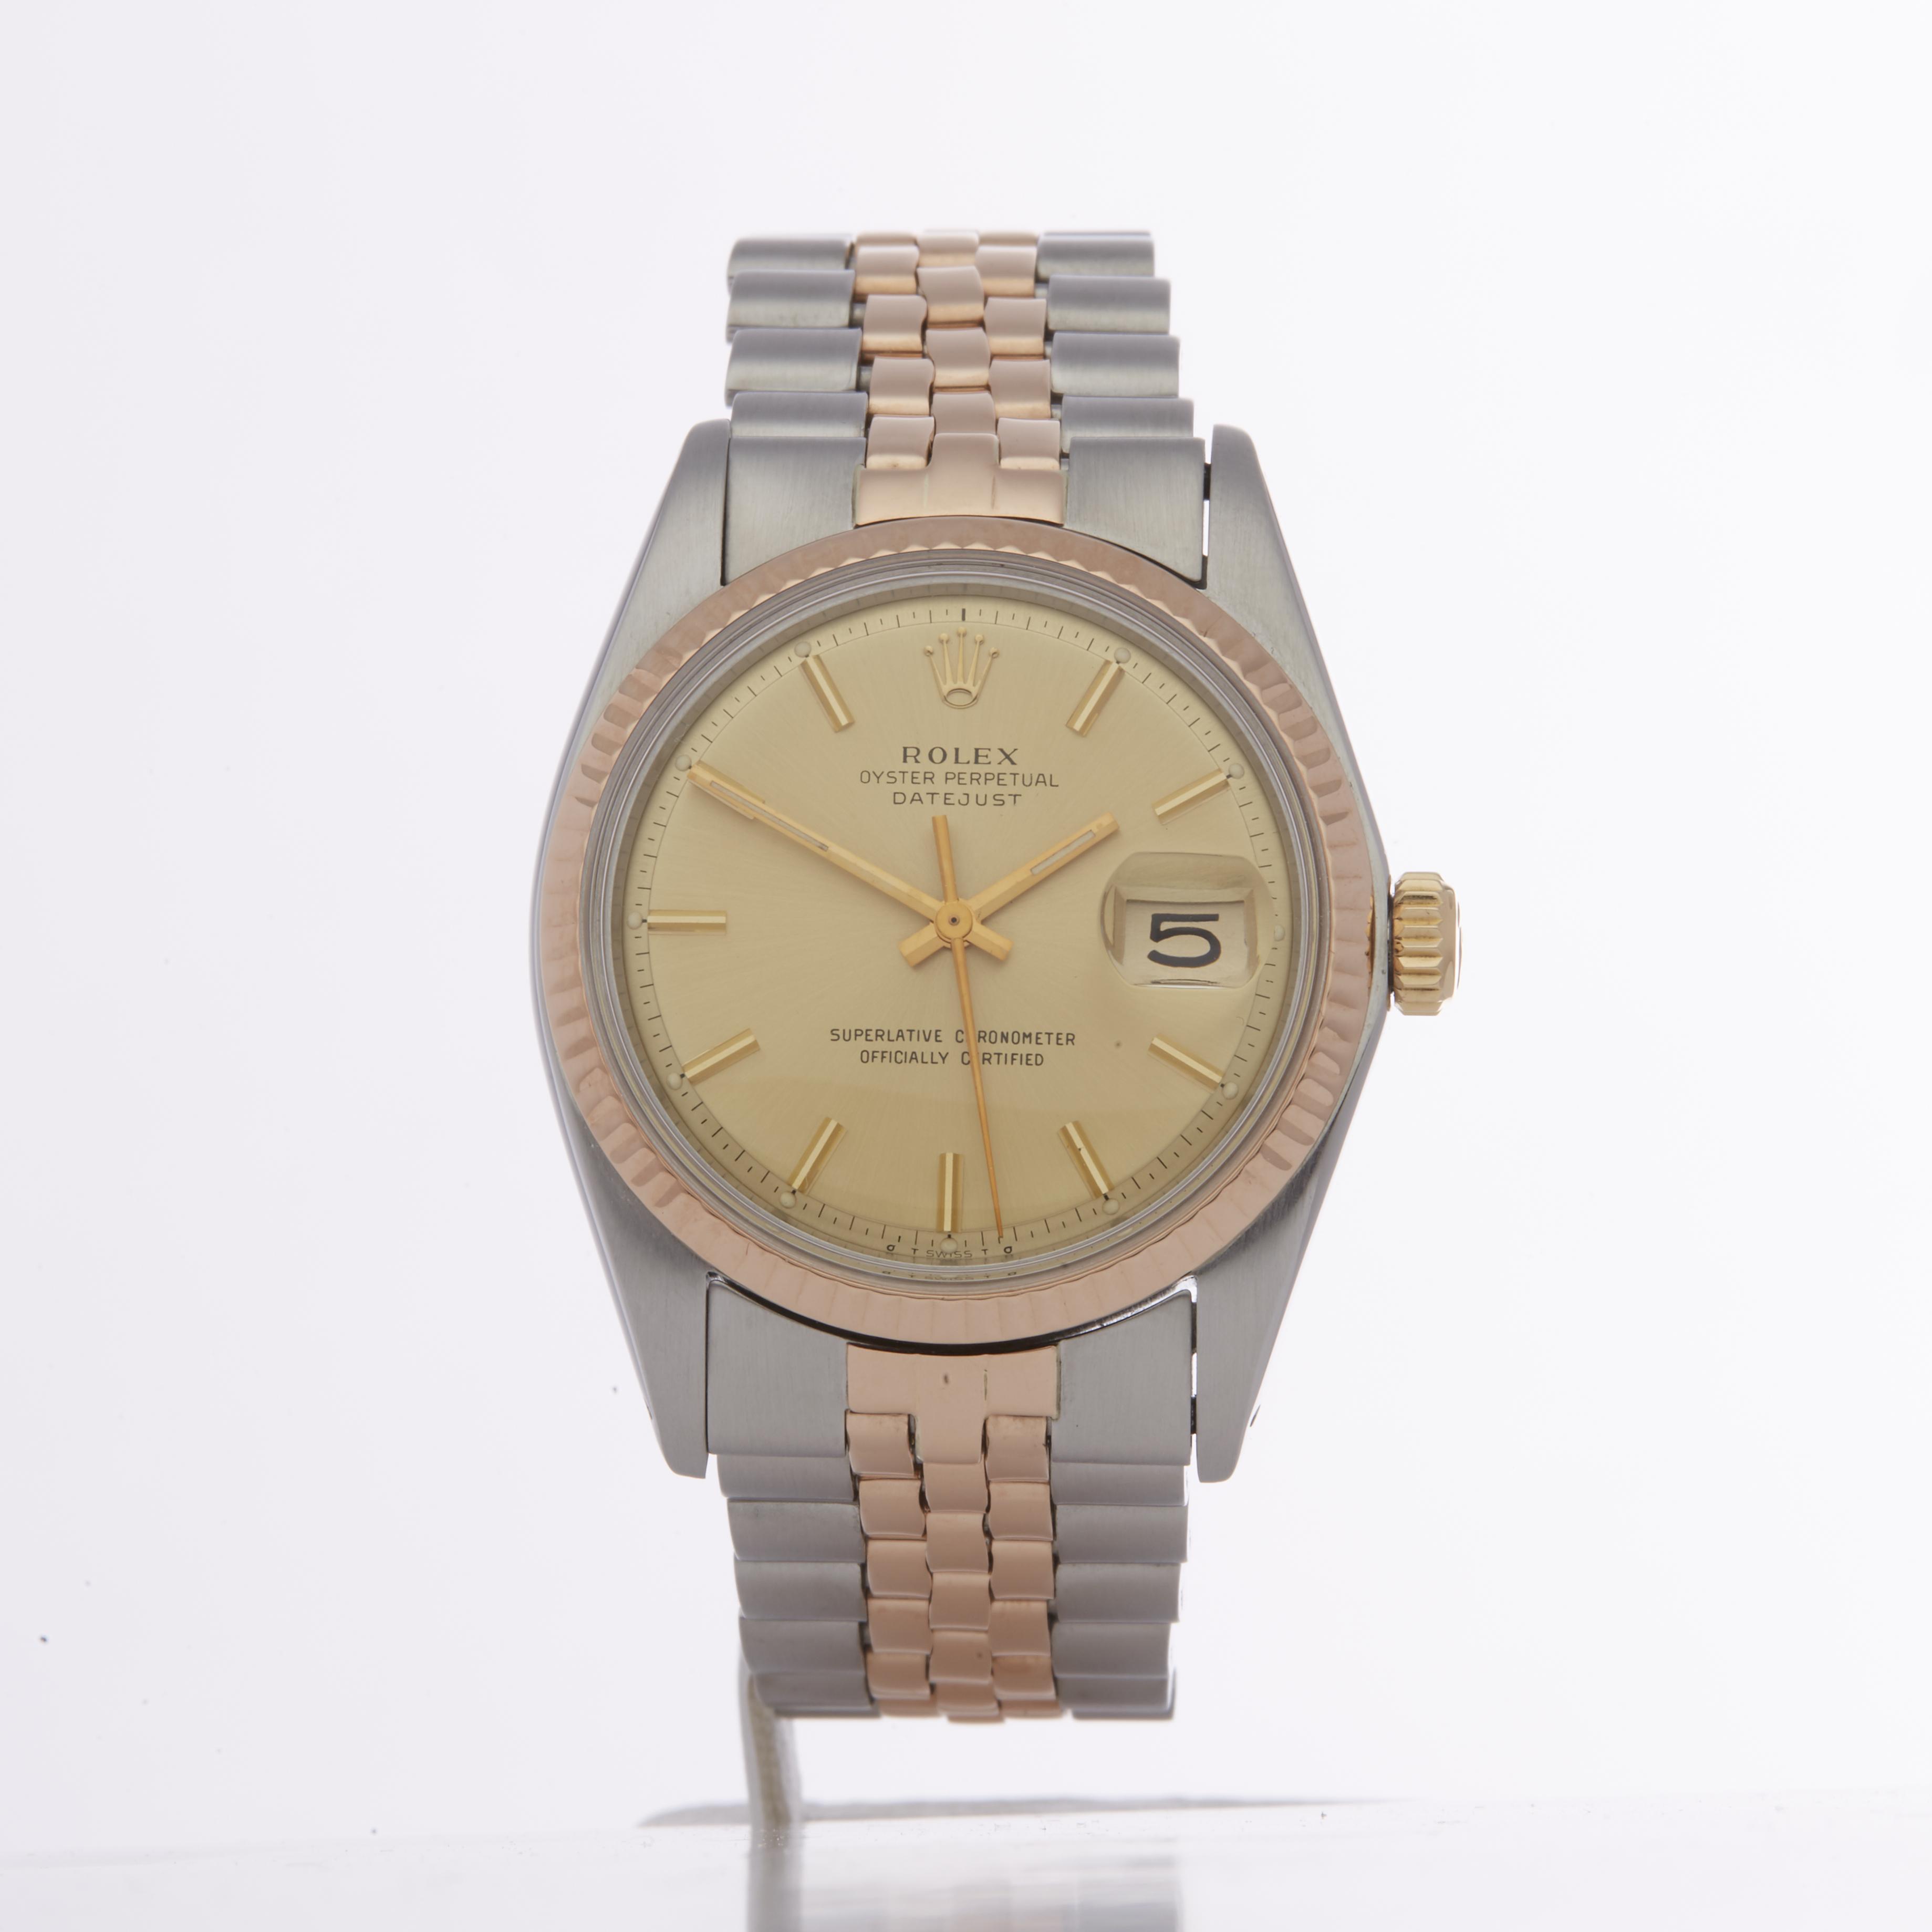 Rolex Datejust 36 1601 Men Rose Gold & Stainless Steel Watch